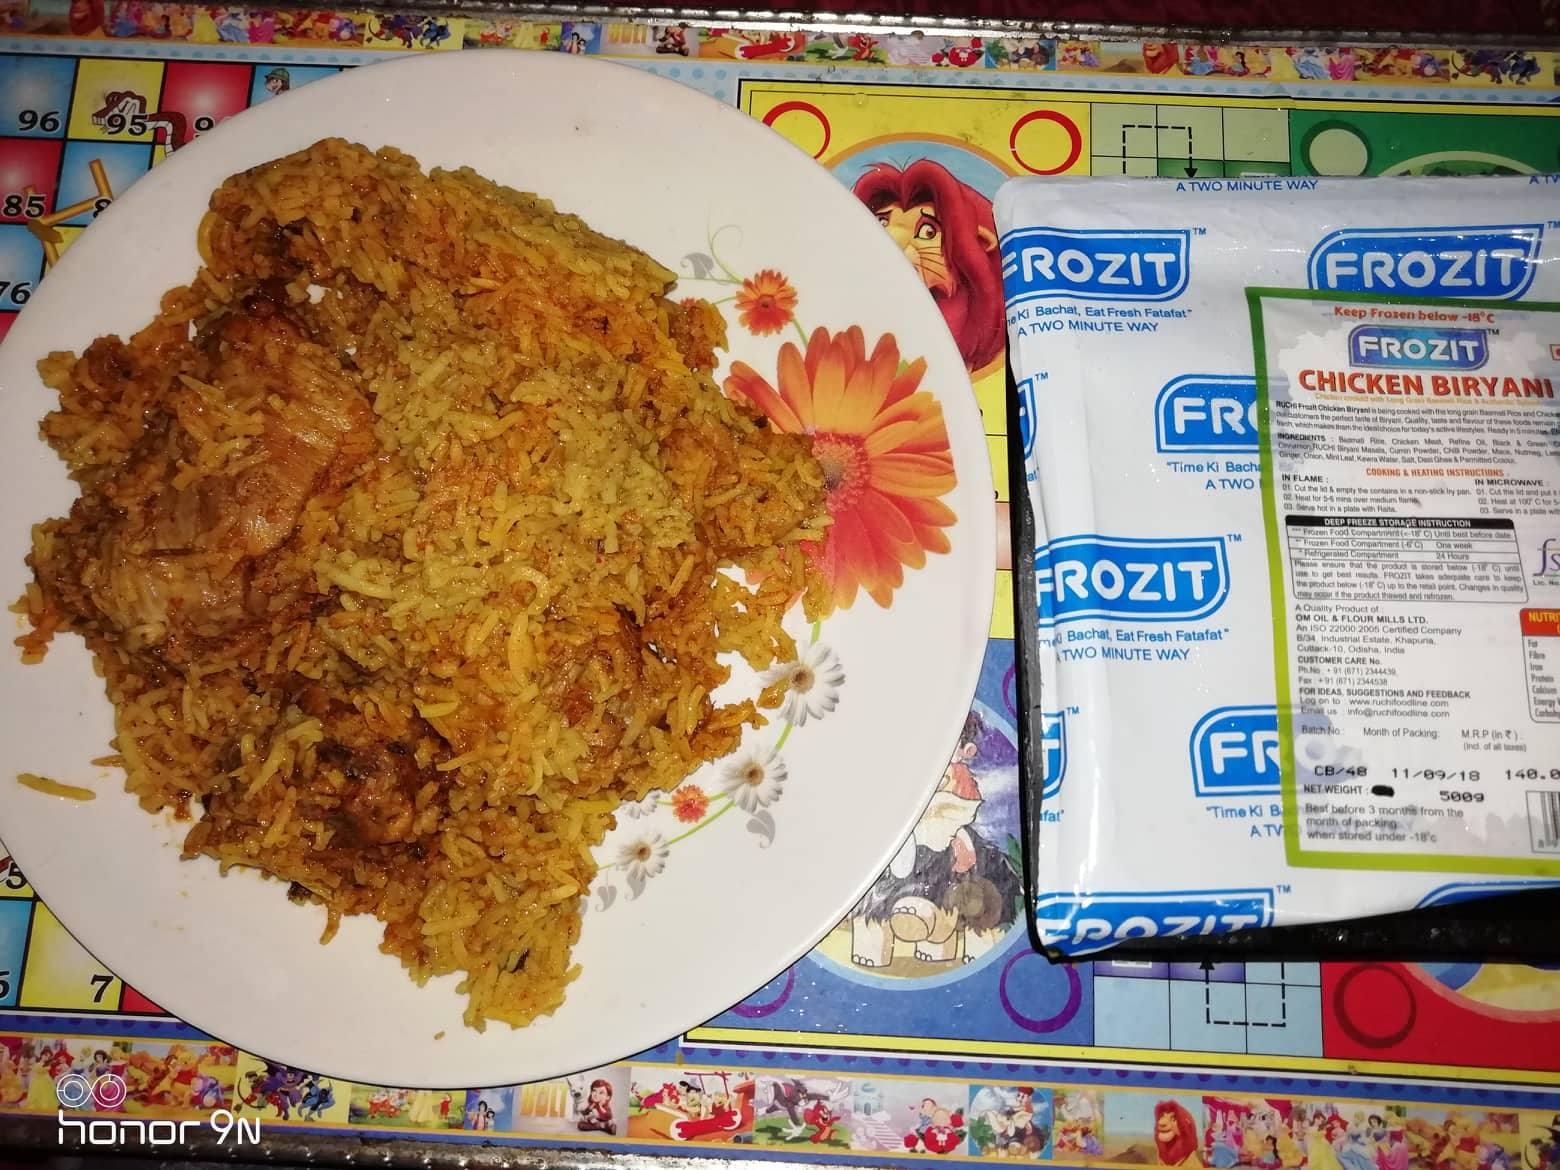 Ruchi Foodline Products